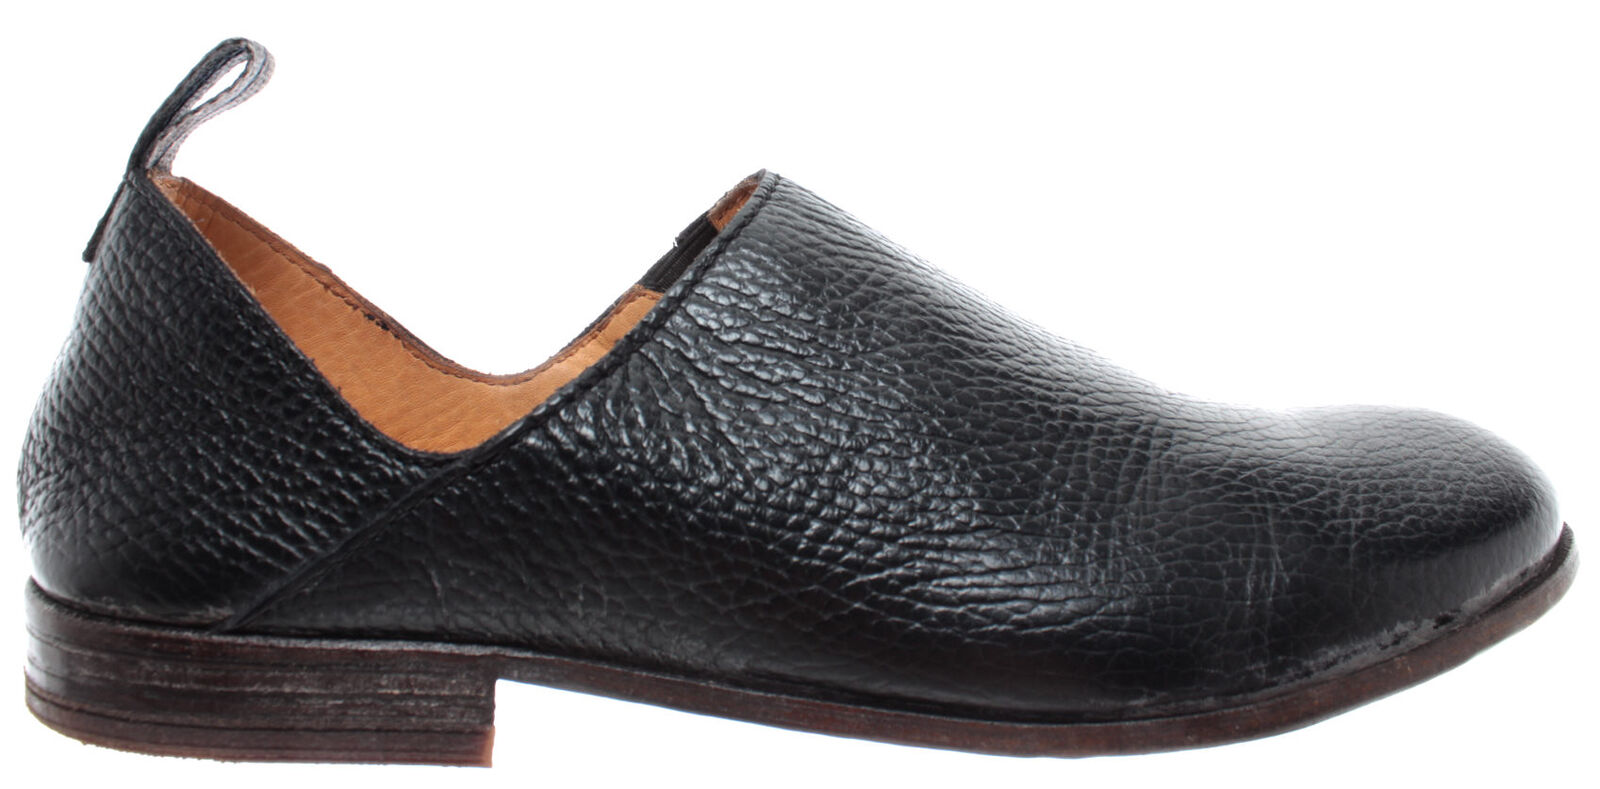 MOMA zapatos mujer Mocassini Slip On 43802-Y1 Vitello negro Pelle Hand Made